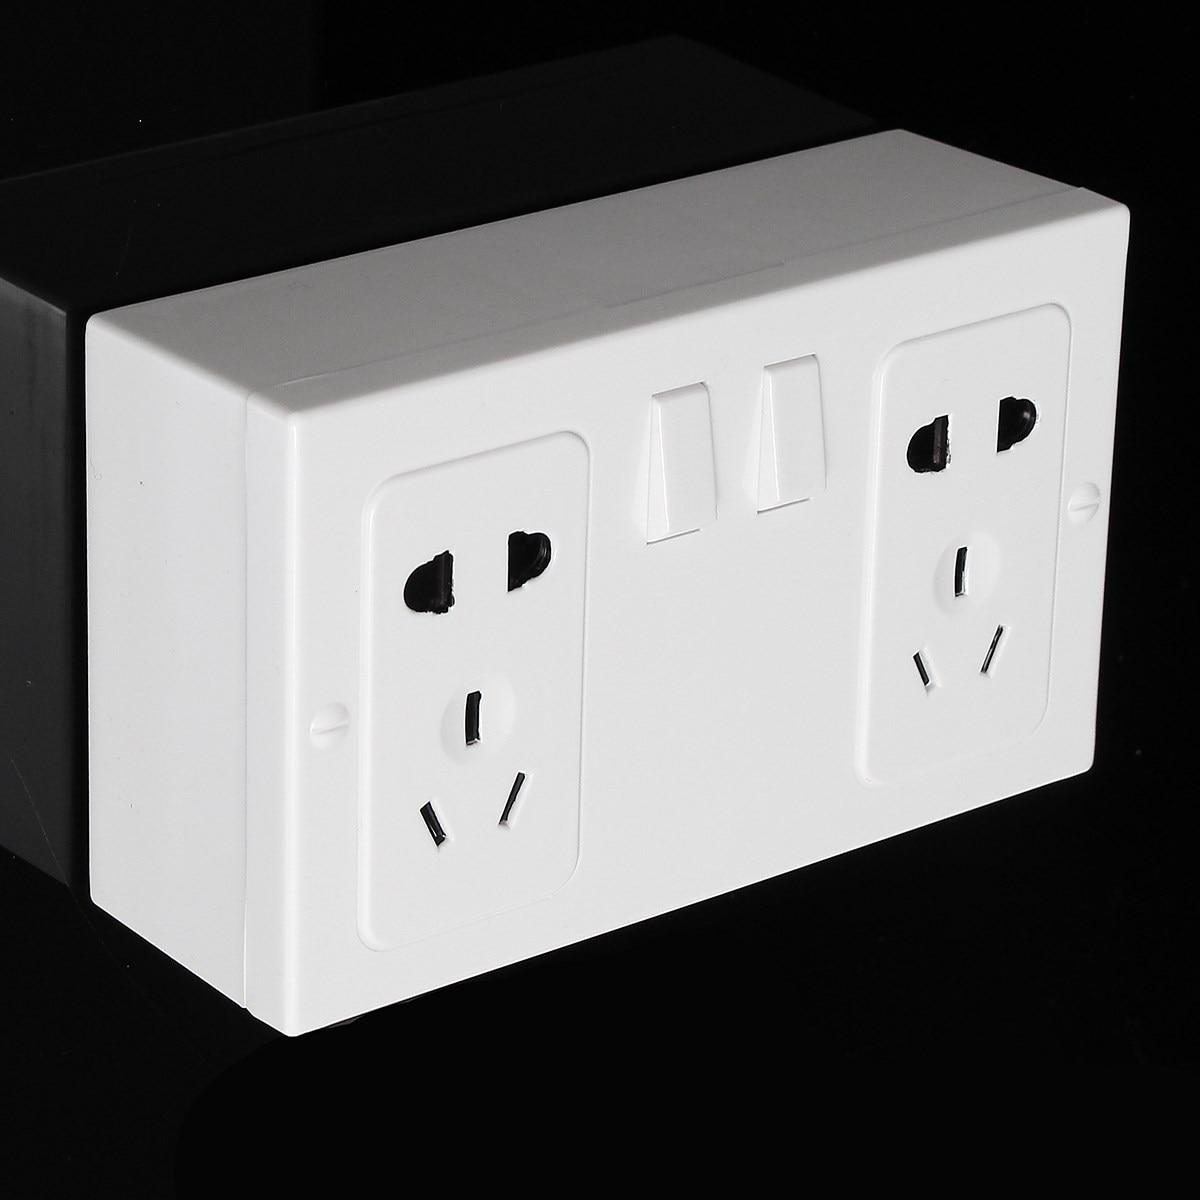 Double Plug Socket Imitation Storage Box Bin Wall Hanging Valuables